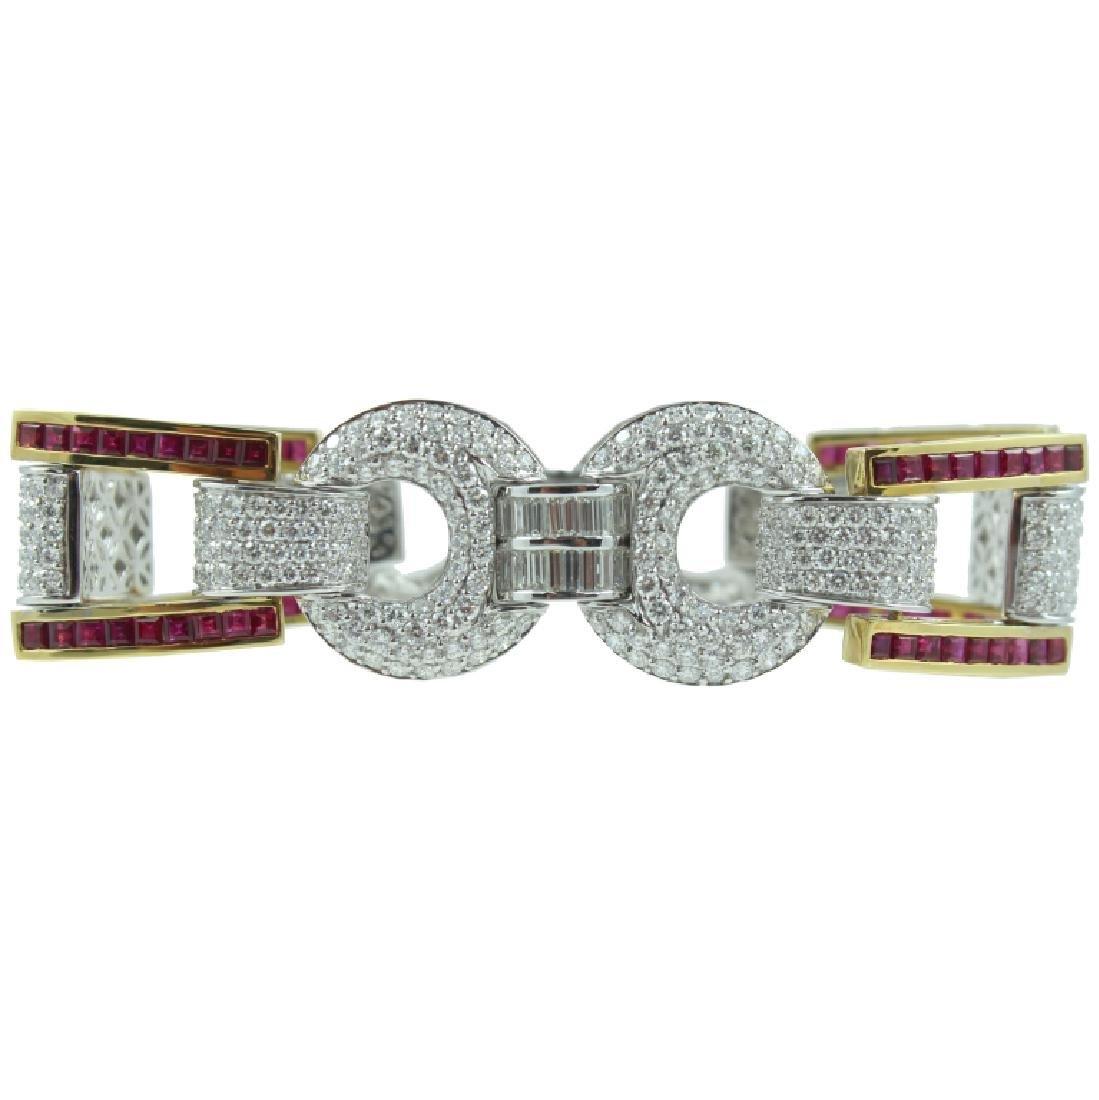 18K Yellow & White Gold, Diamond & Ruby Bracelet